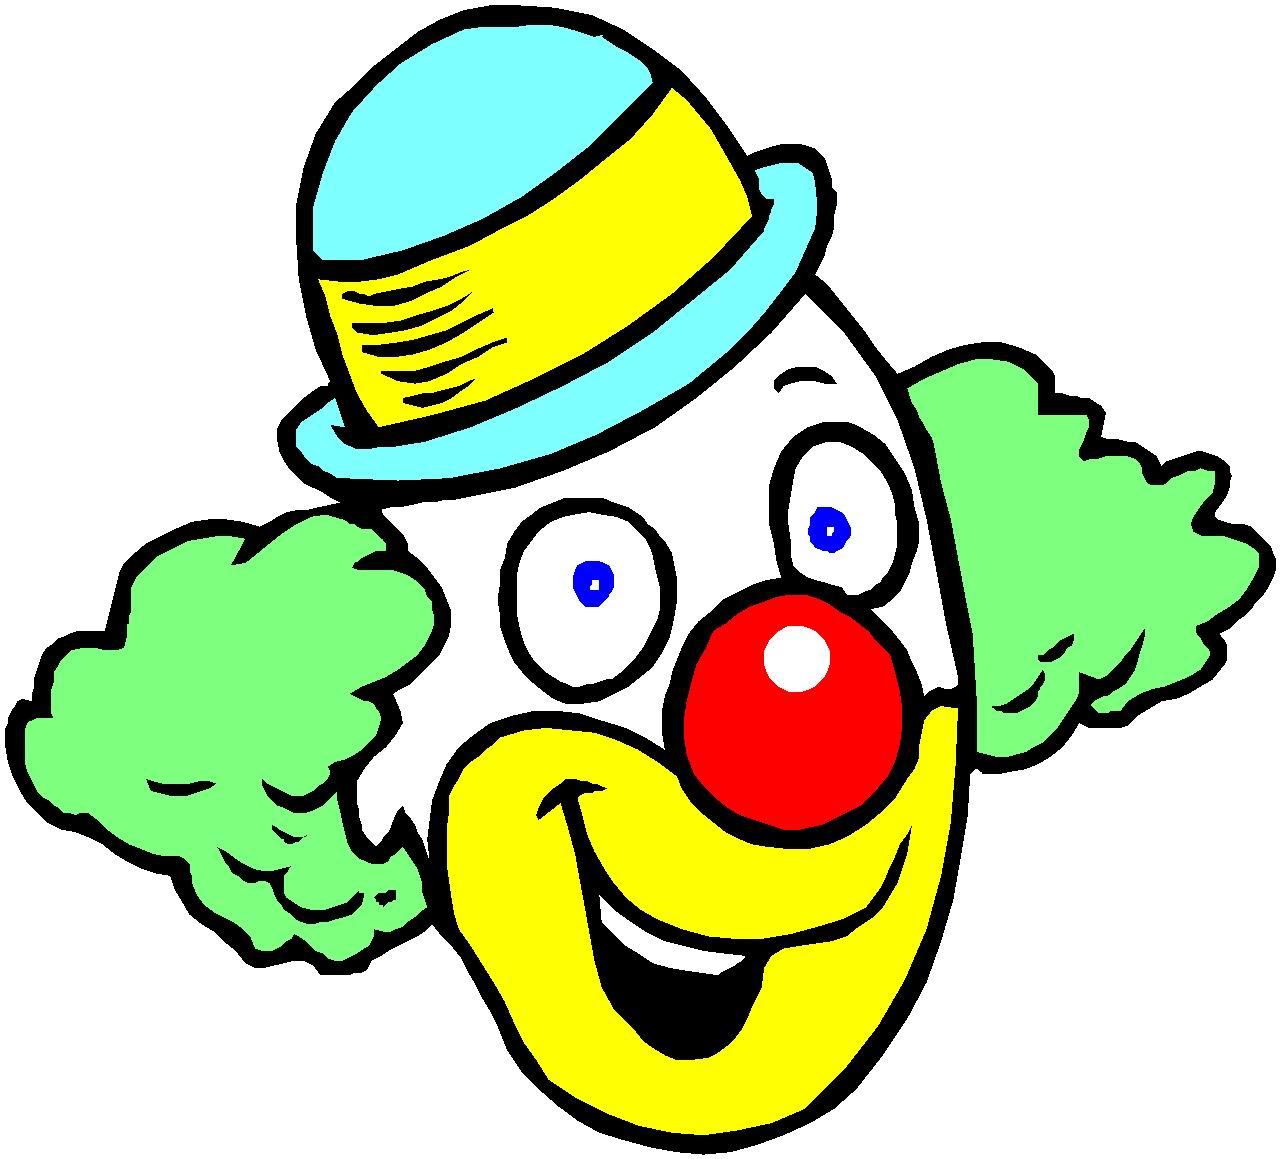 Clown Clip Art Free - ClipArt Best - 120.5KB